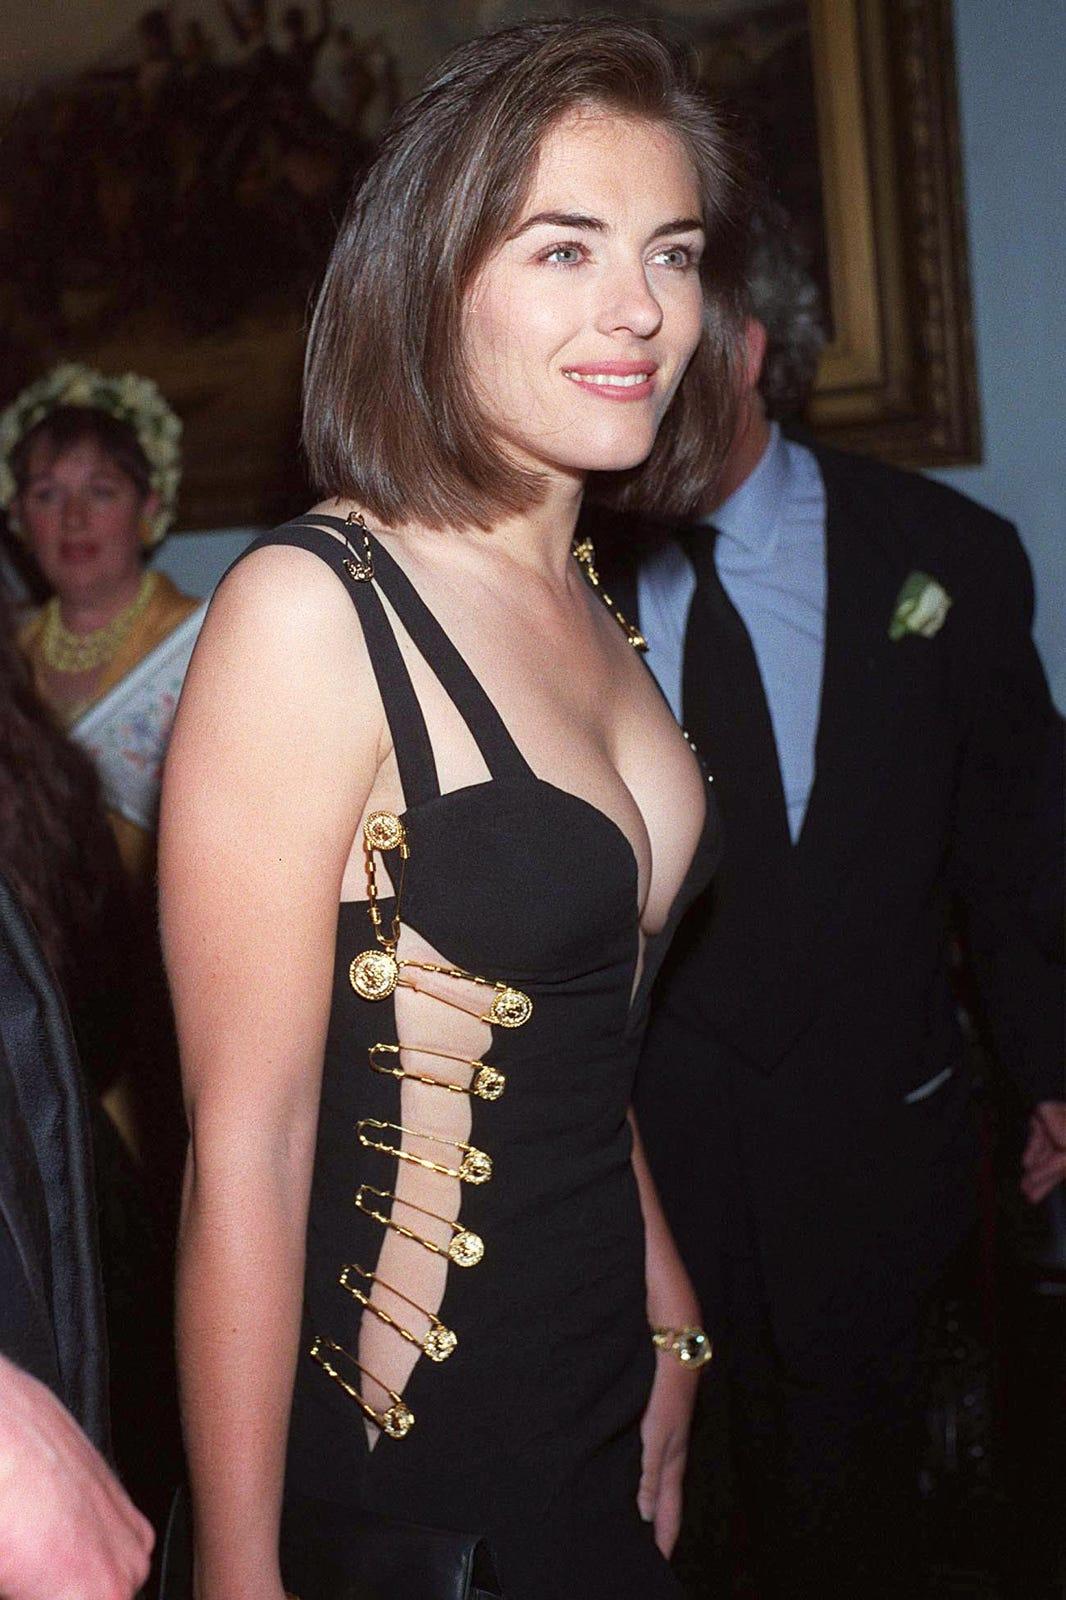 Liz hurley versace dress - Liz Hurley Versace Dress 35